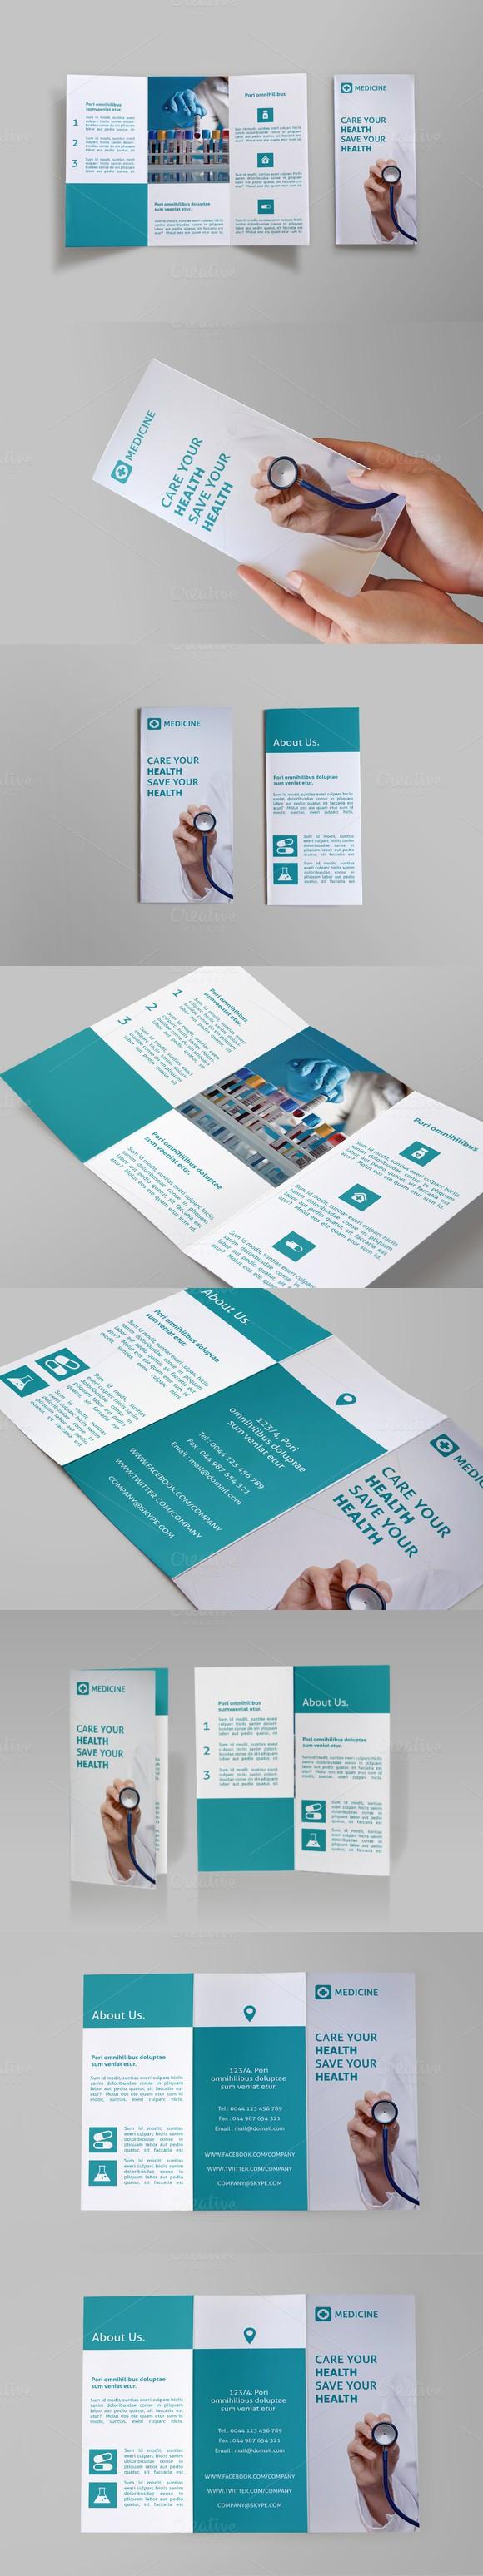 Medicine Tri-fold Brochure - Doc | Tri fold brochure, Tri fold and ...